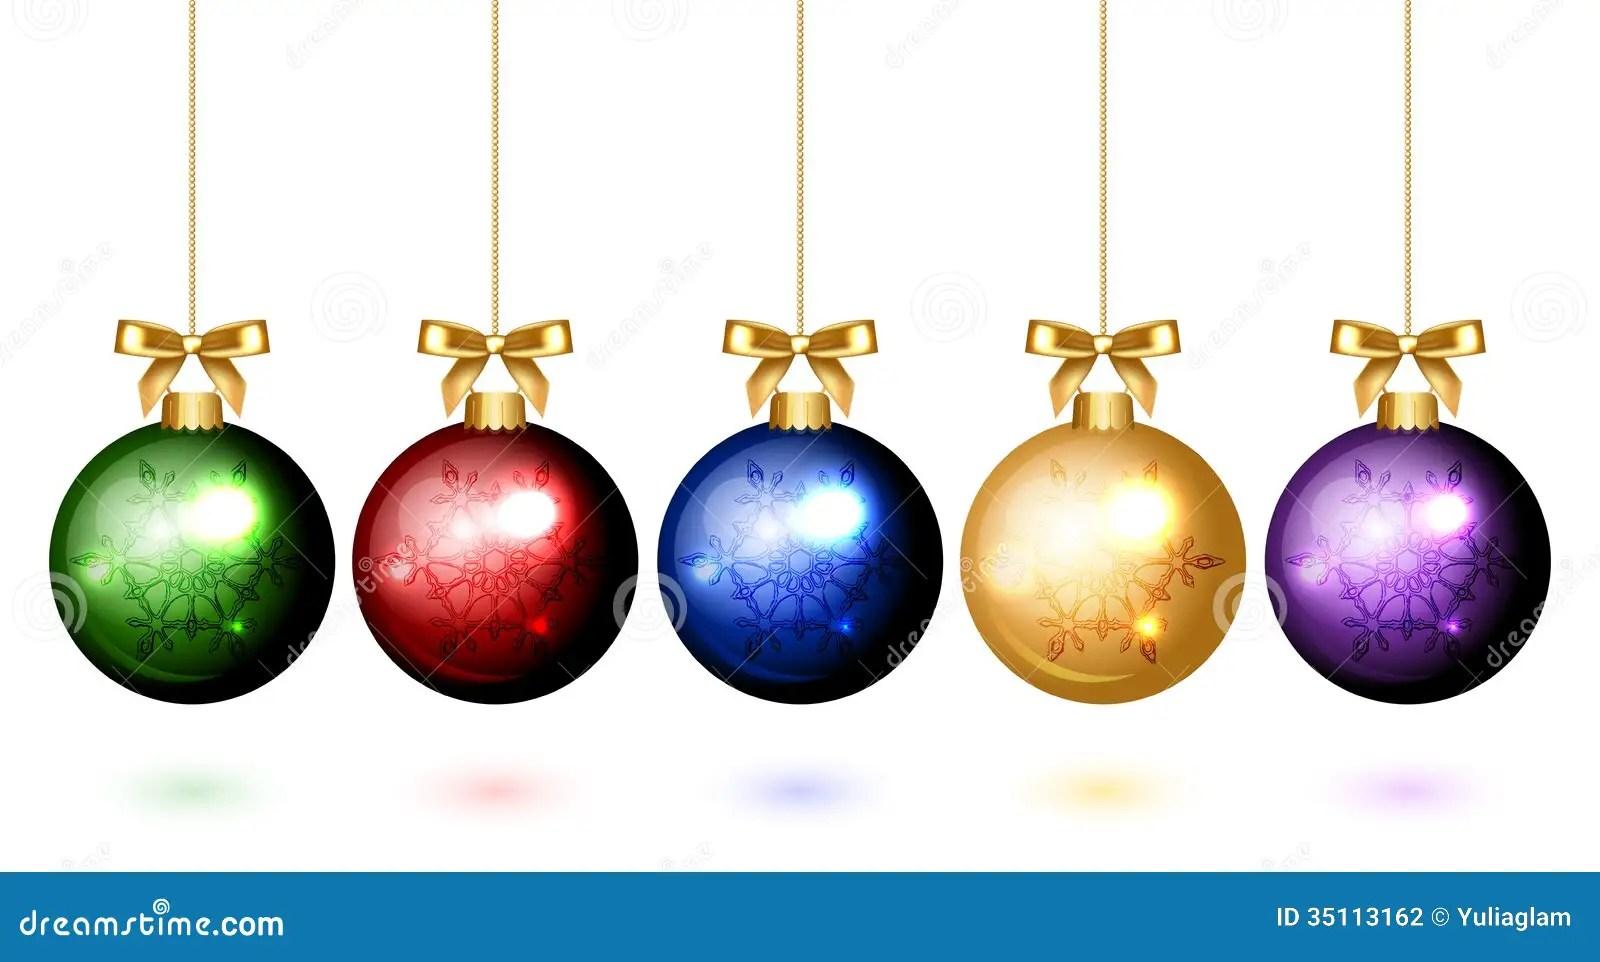 Colorful Christmas Balls With Snowflake Ornament Stock